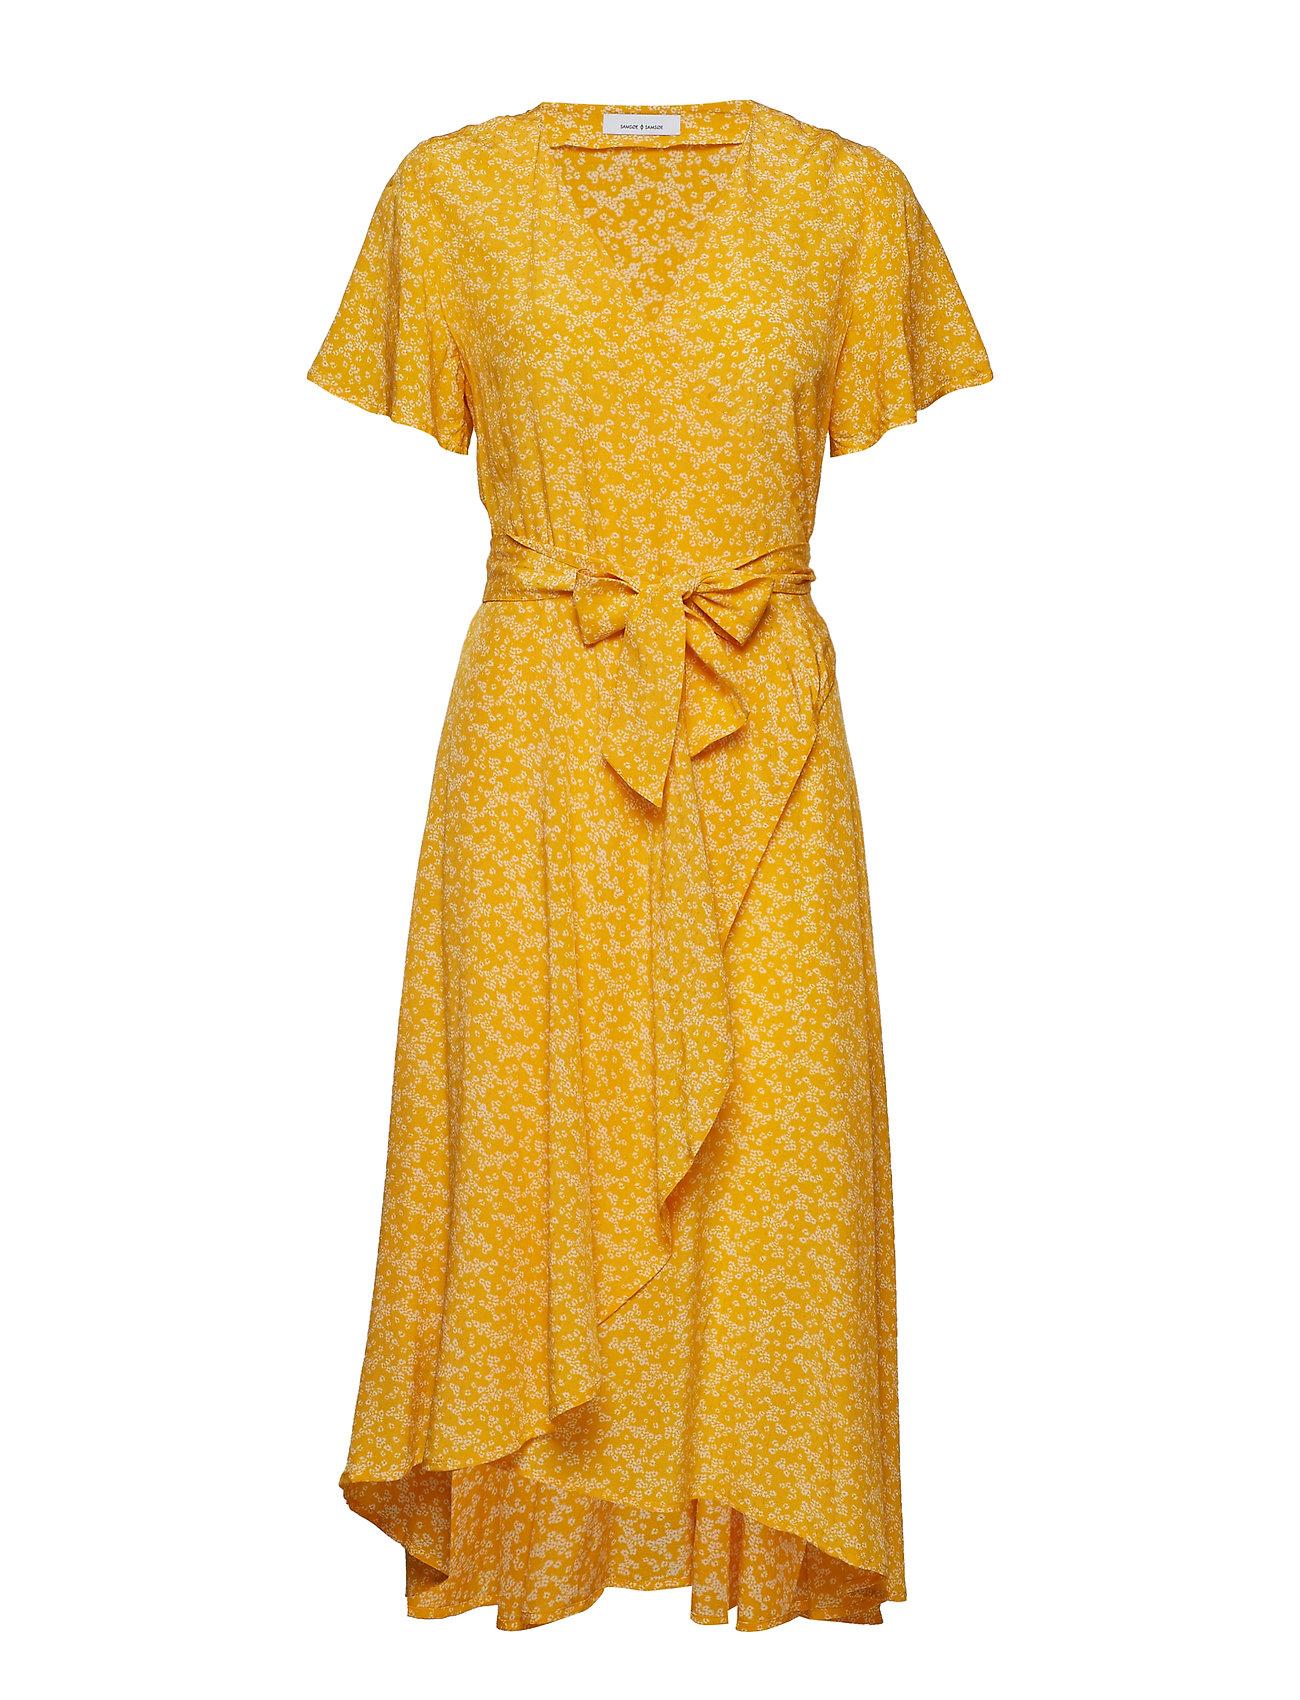 Veneto Veneto 10458aranciaSamsøeamp; Dress Aop Dress Yyf7bg6